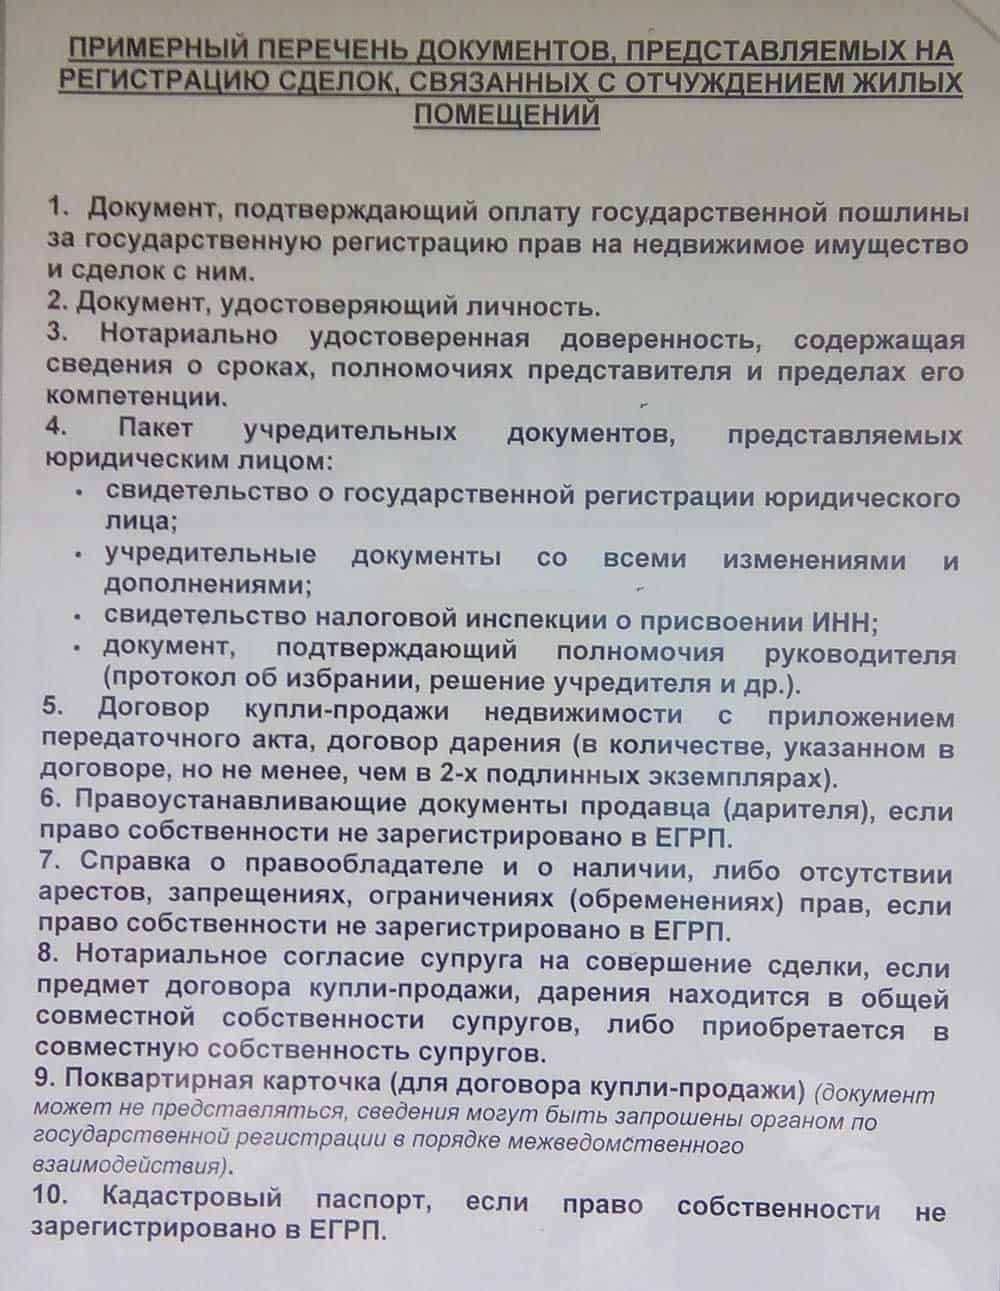 Документы - список